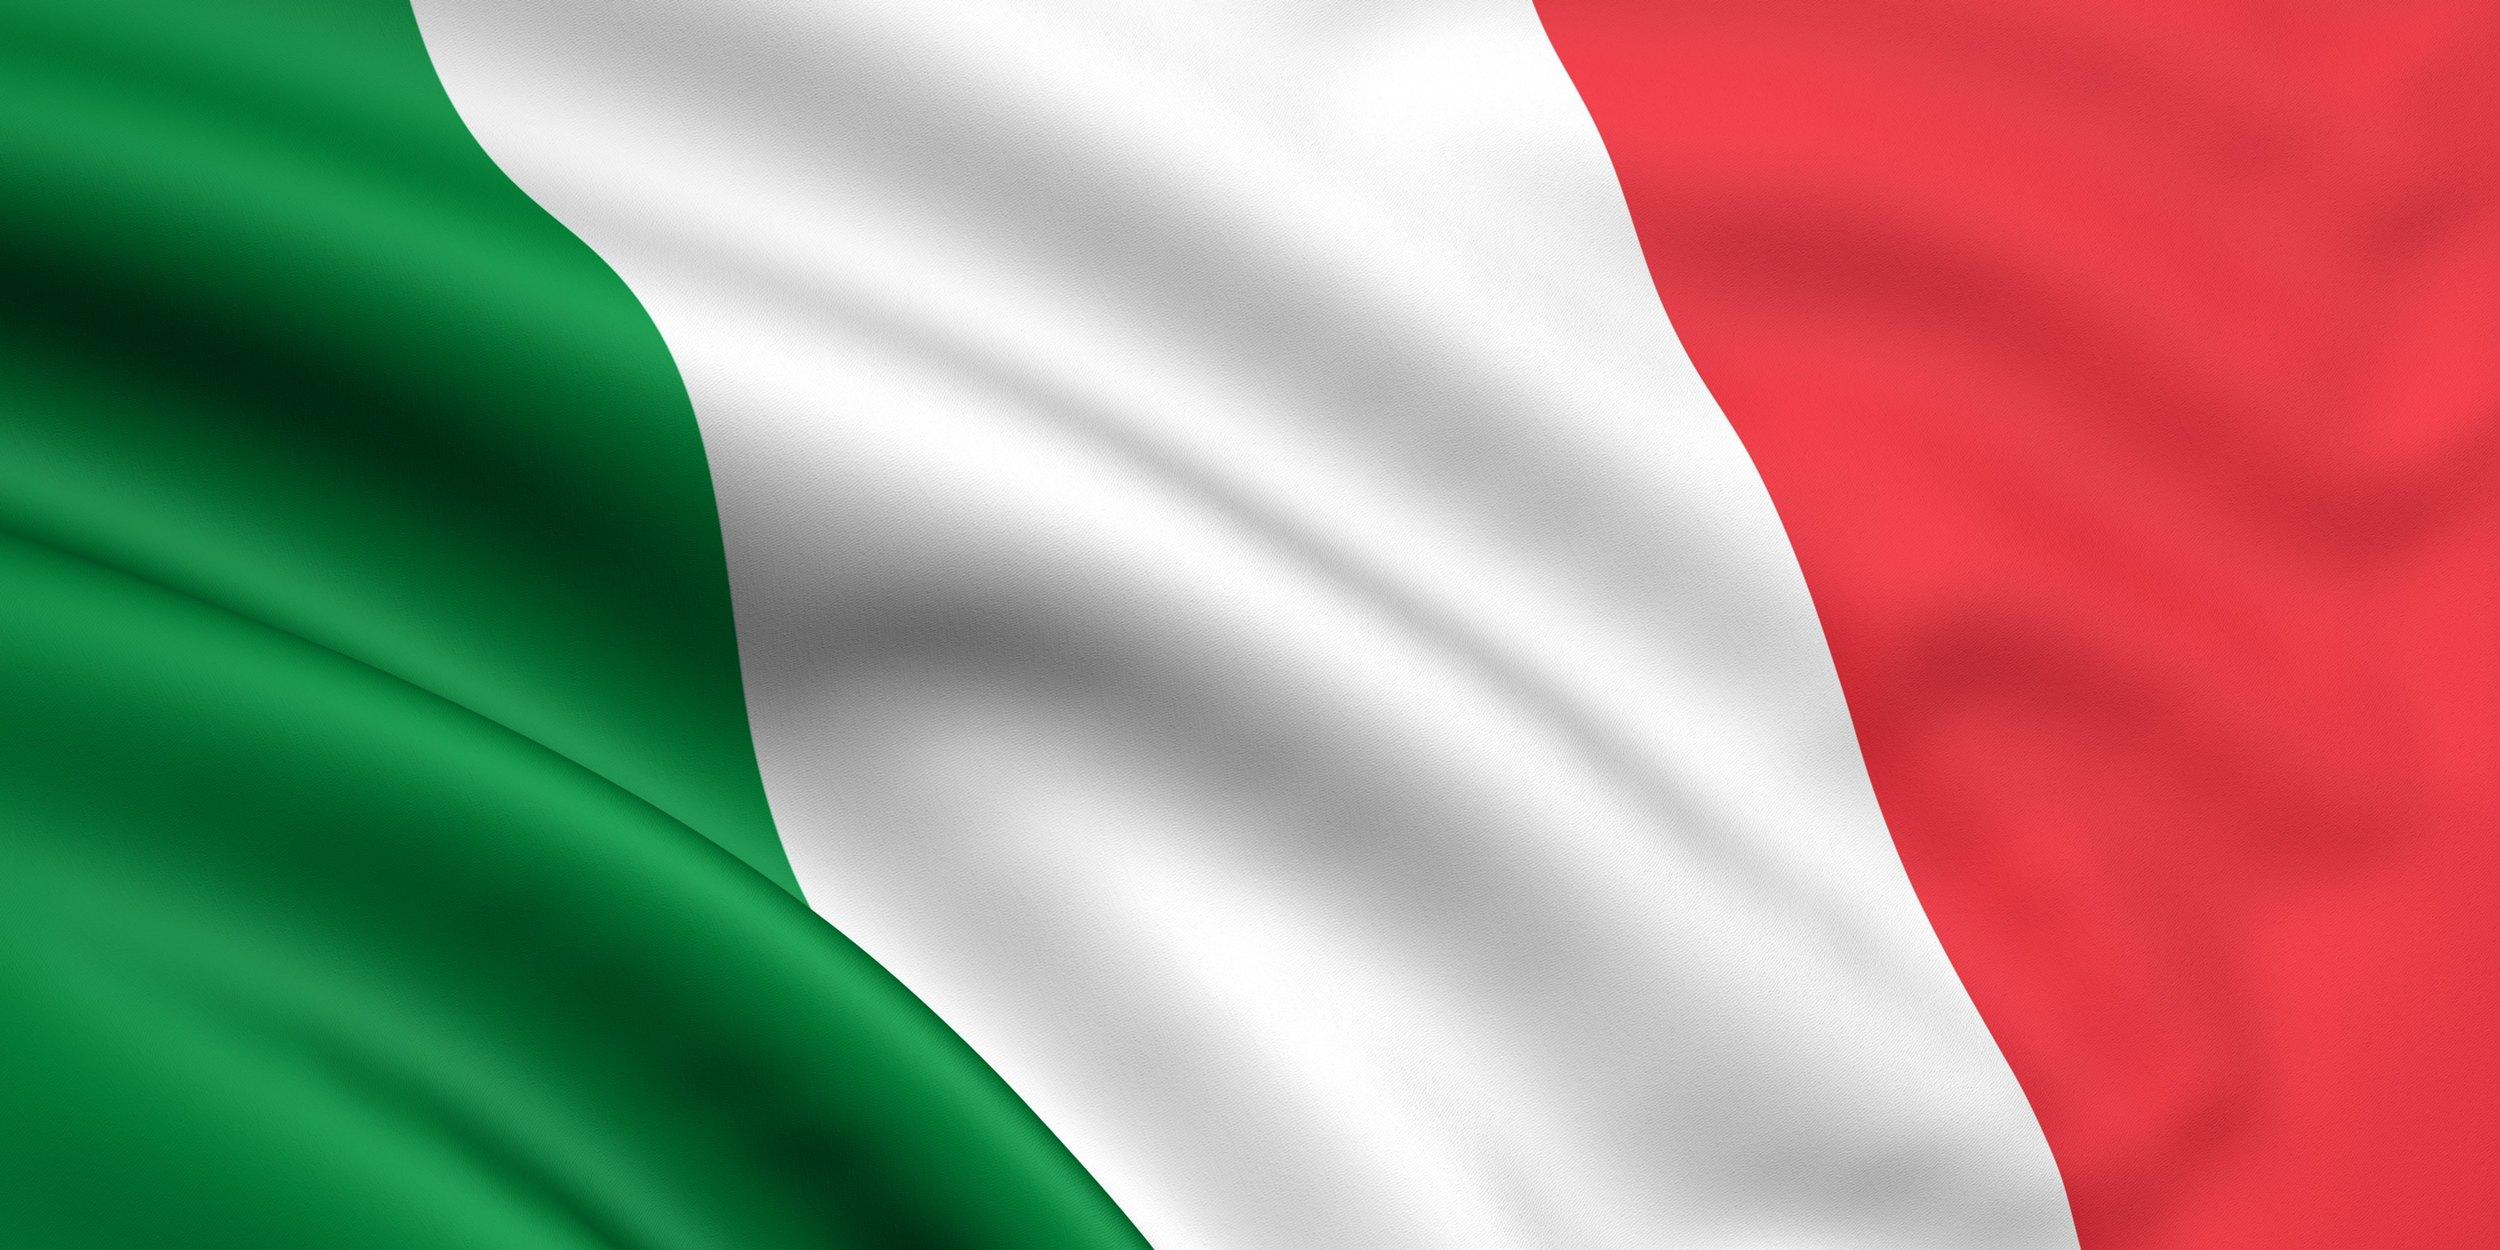 ITALY FLAG dreamstime_4991475 low res.jpg